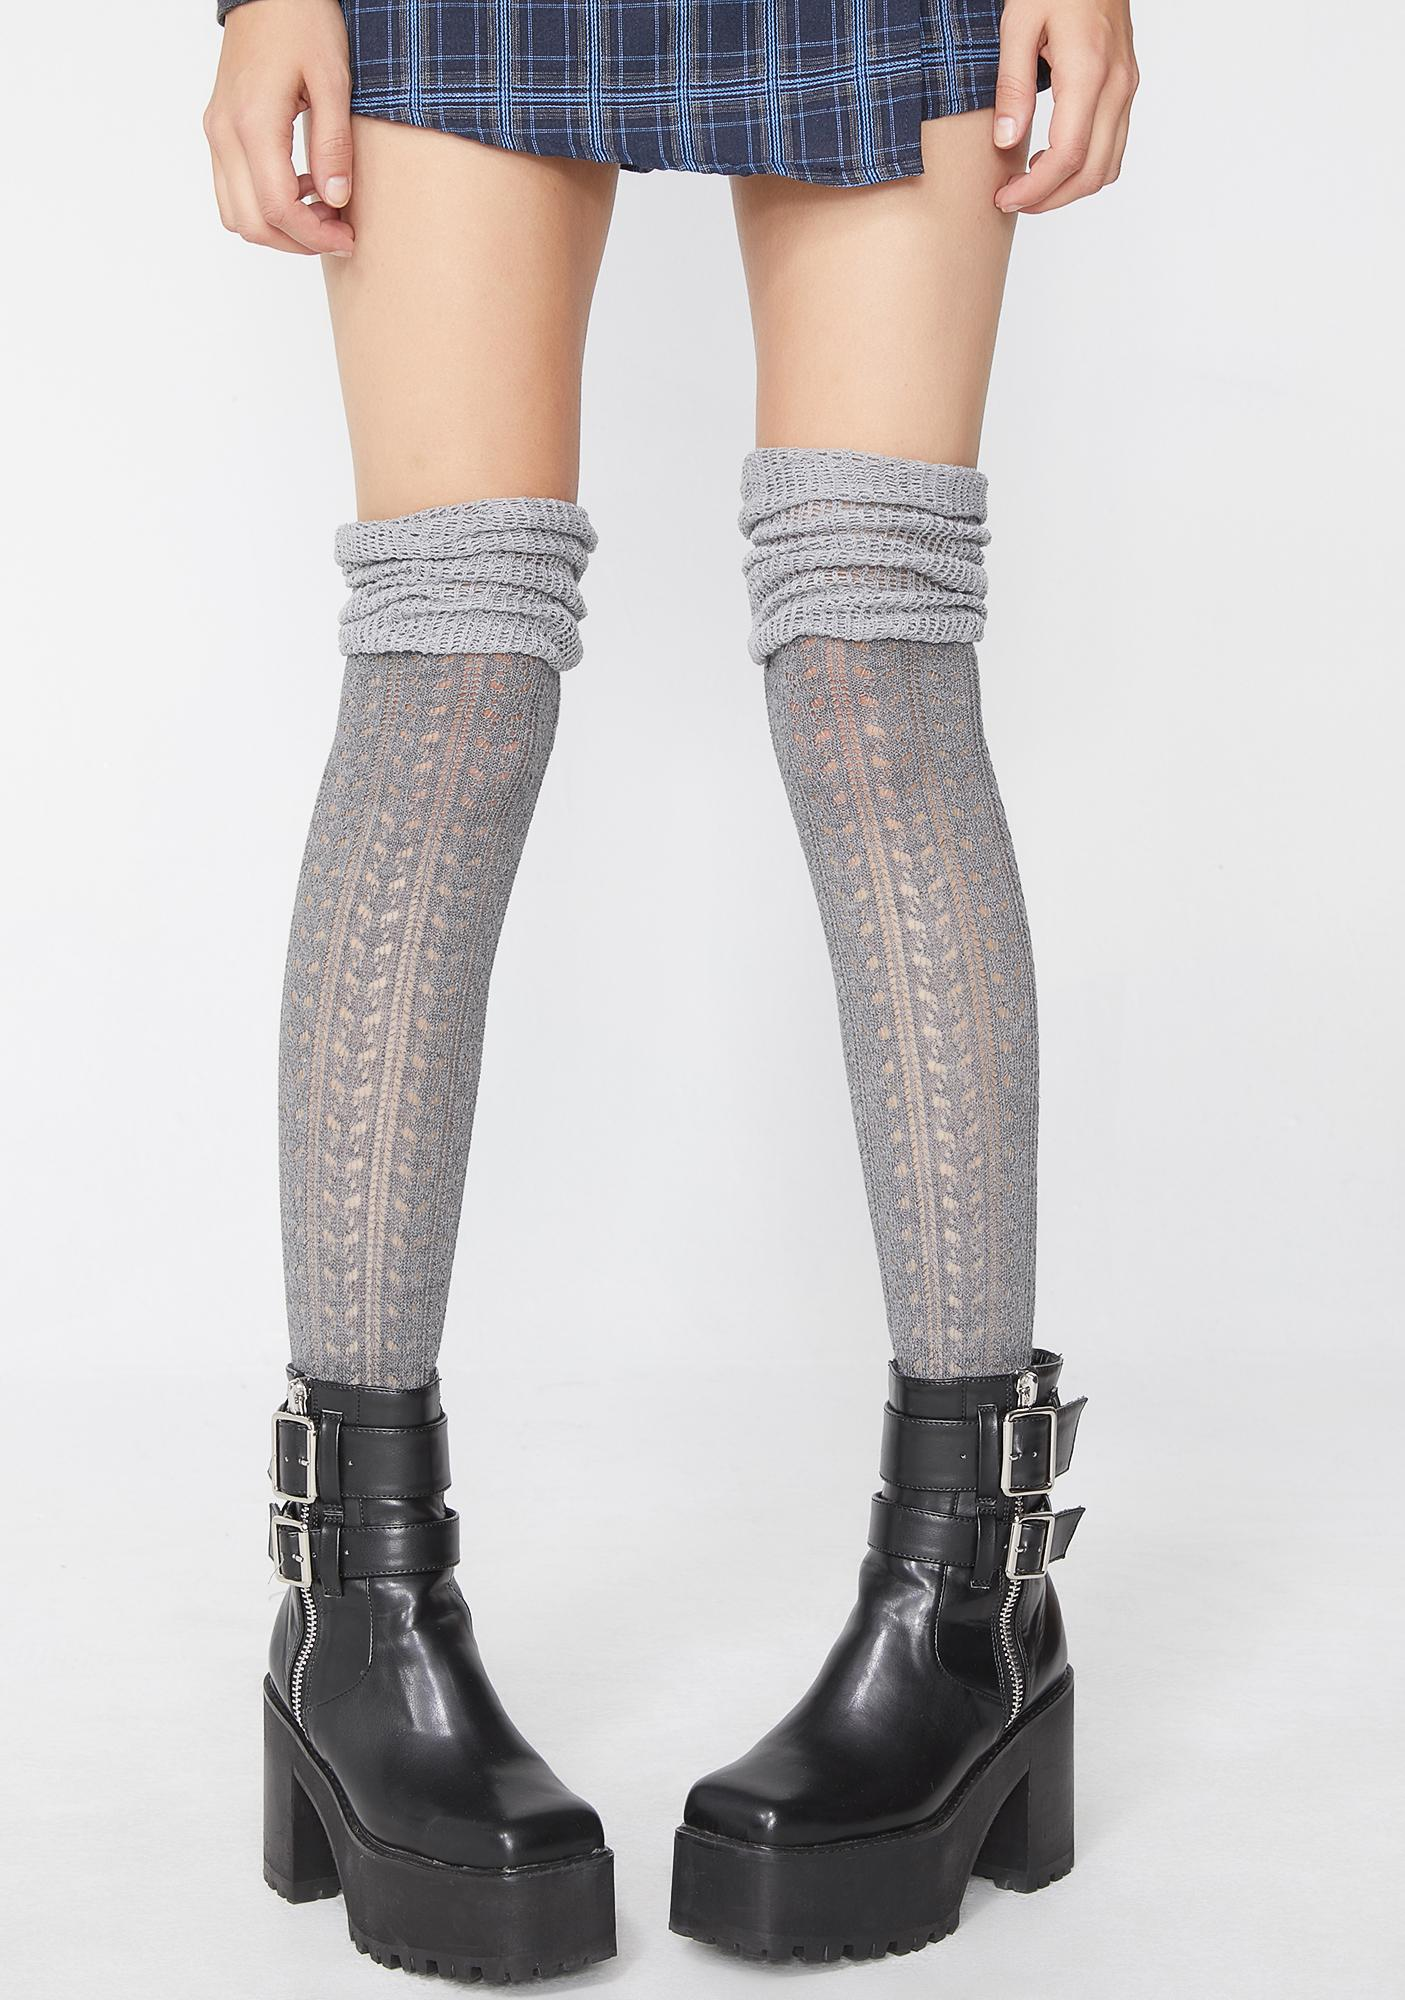 Stoned BB Doll Thigh High Socks